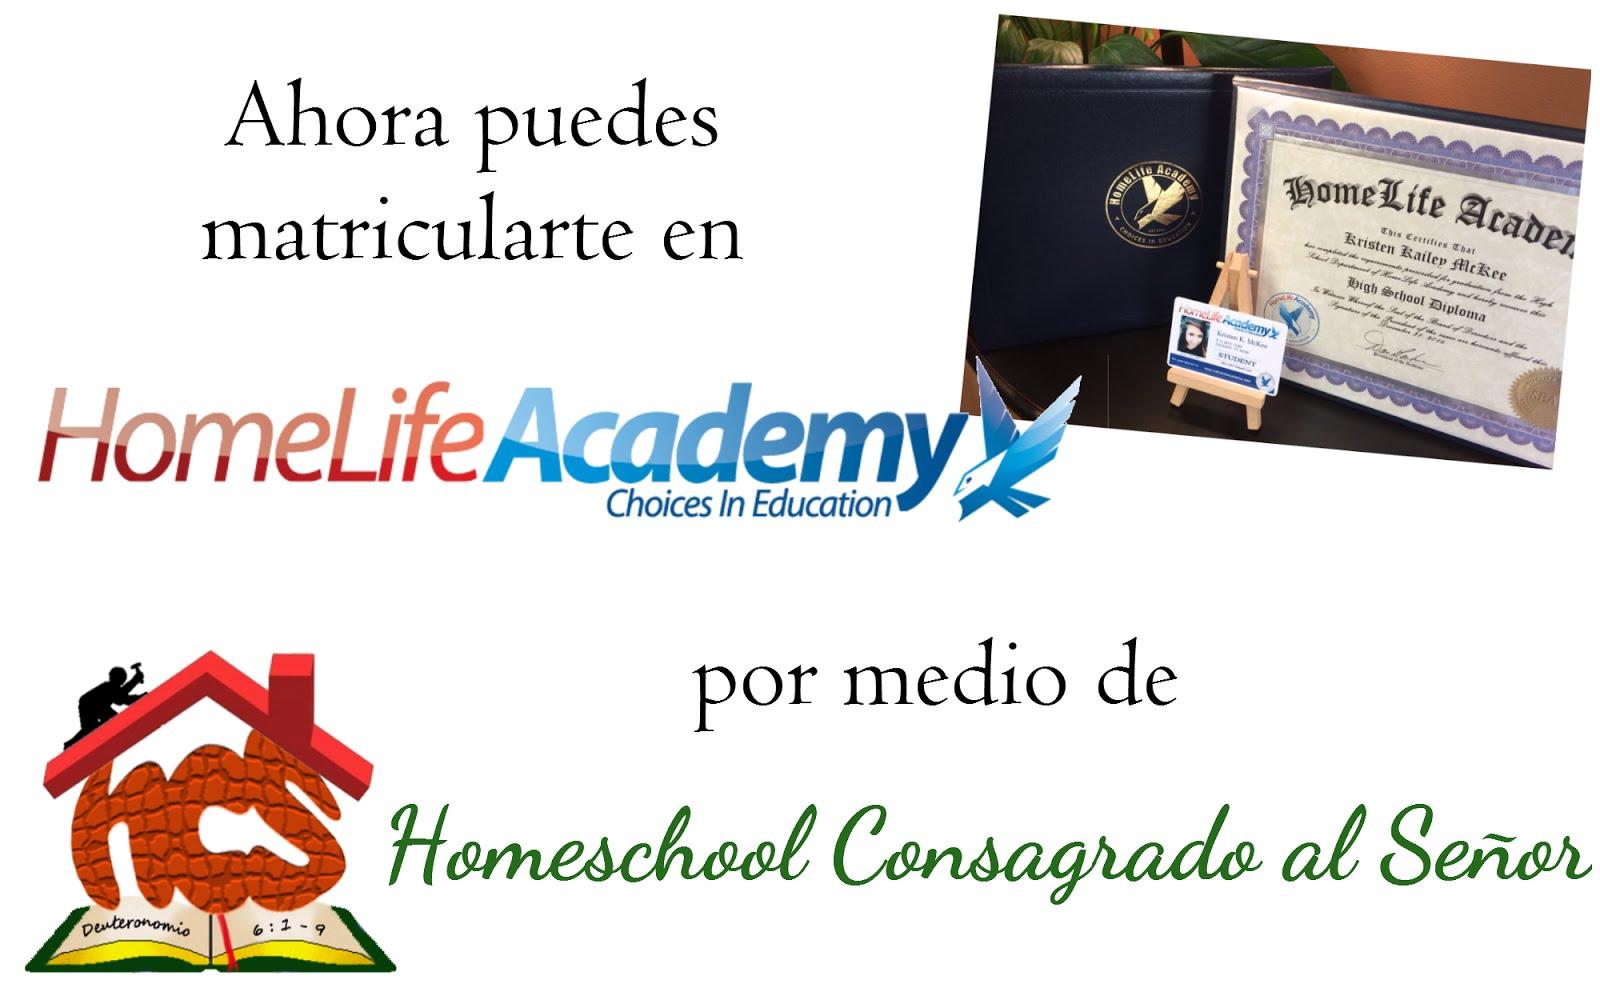 Convenio con HomeLife Academy